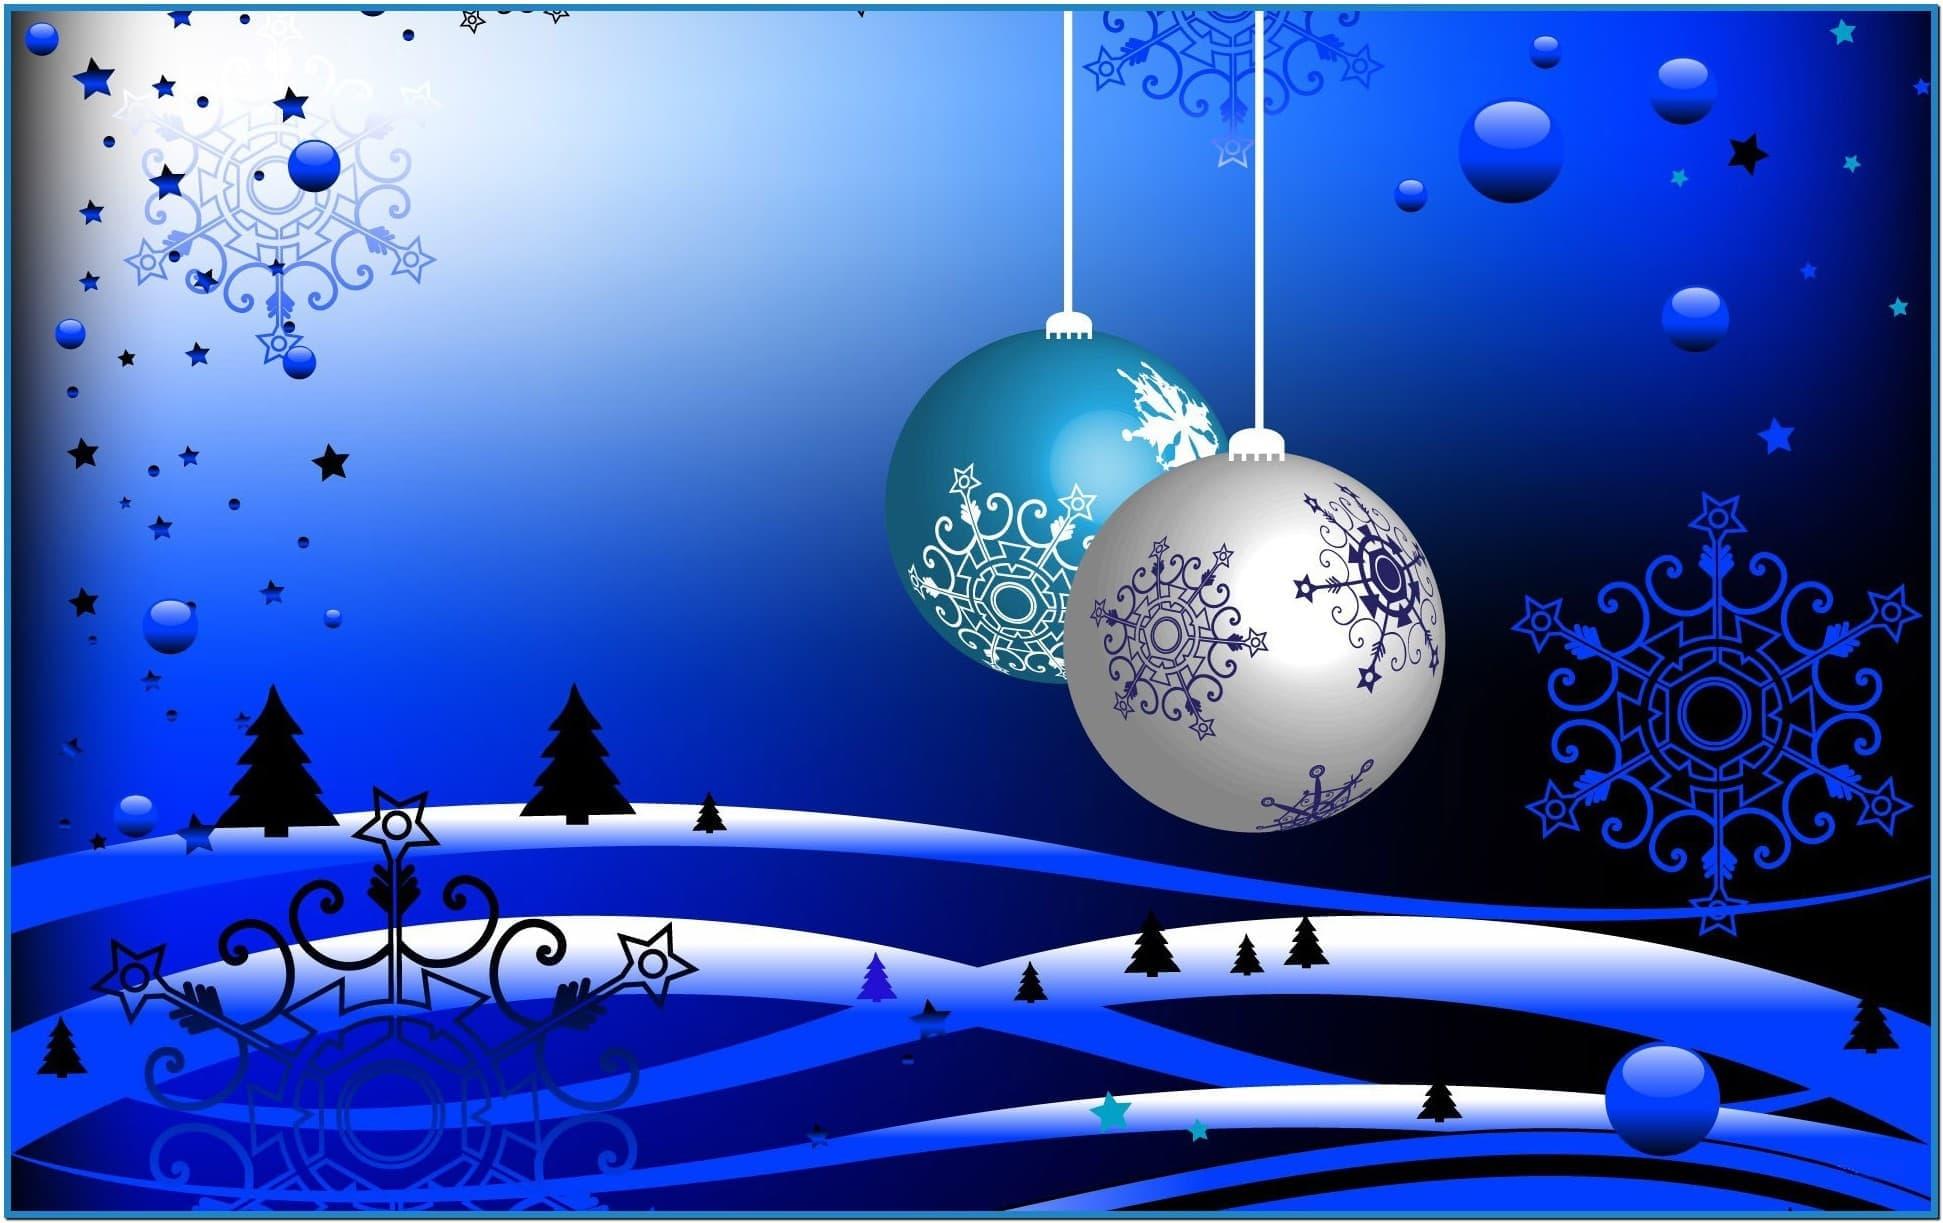 Wallpaper and screensavers christmas desktop - Download free